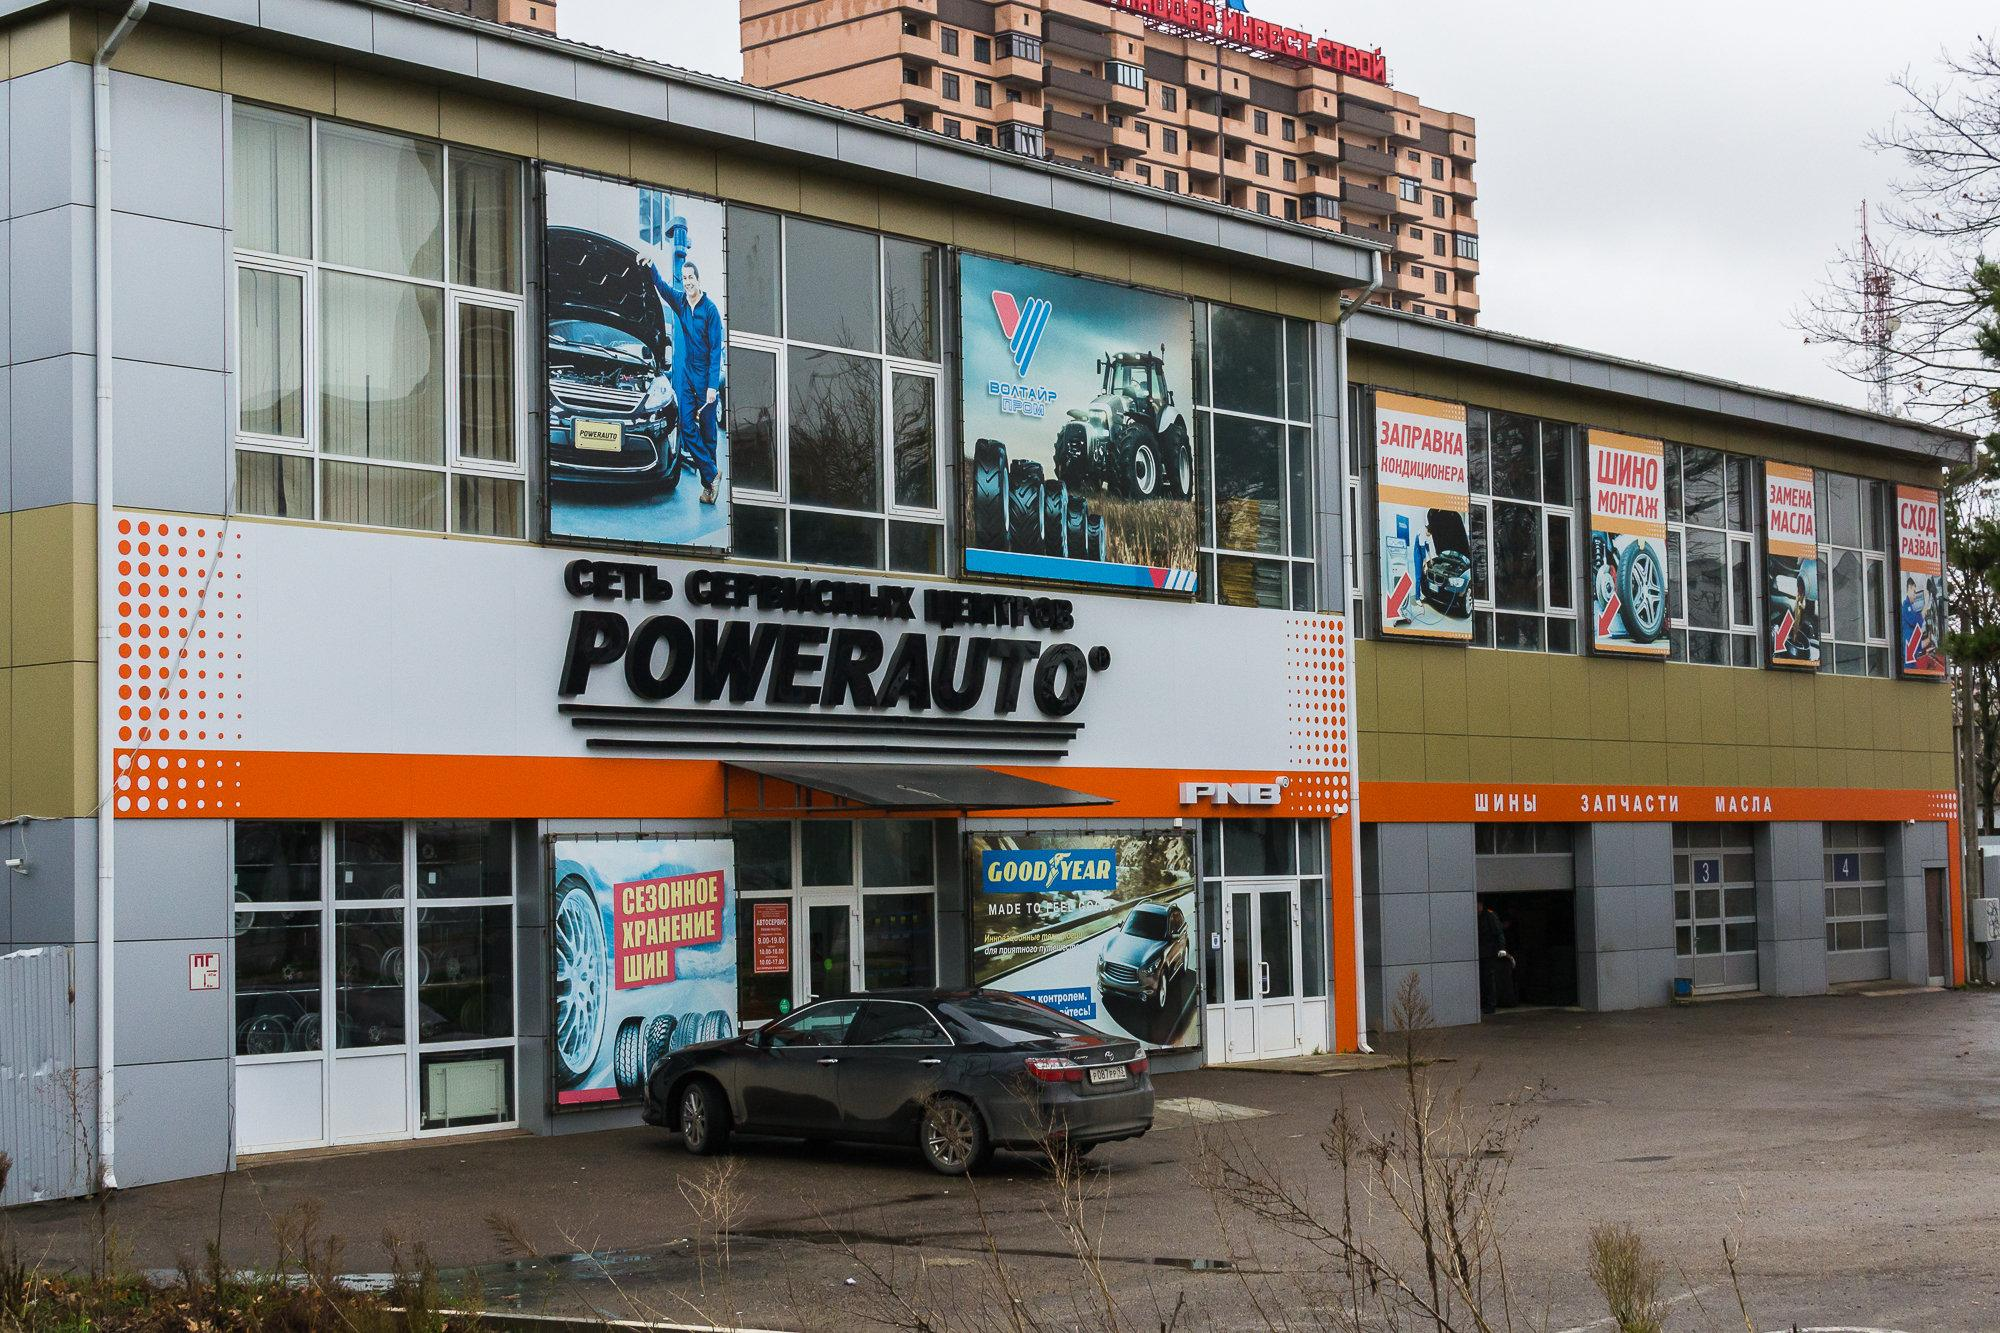 фотография Автосервиса Powerauto на Ростовском шоссе